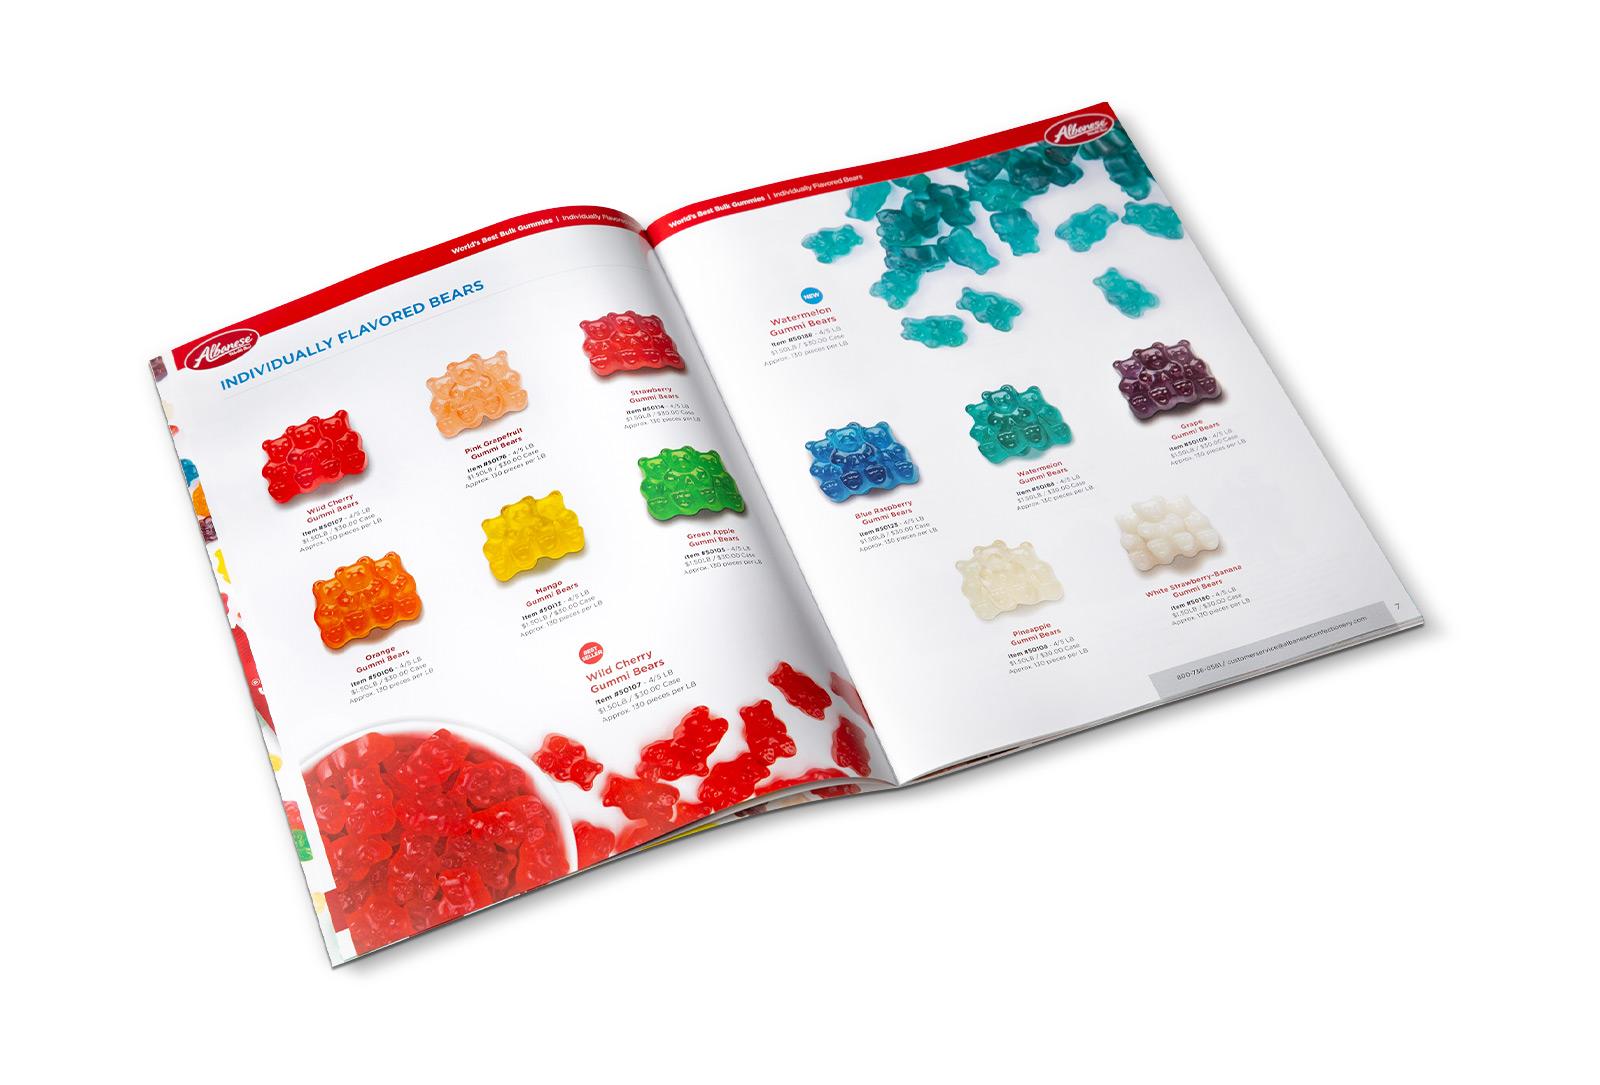 Albanese gummy bear flavors catalog spread design